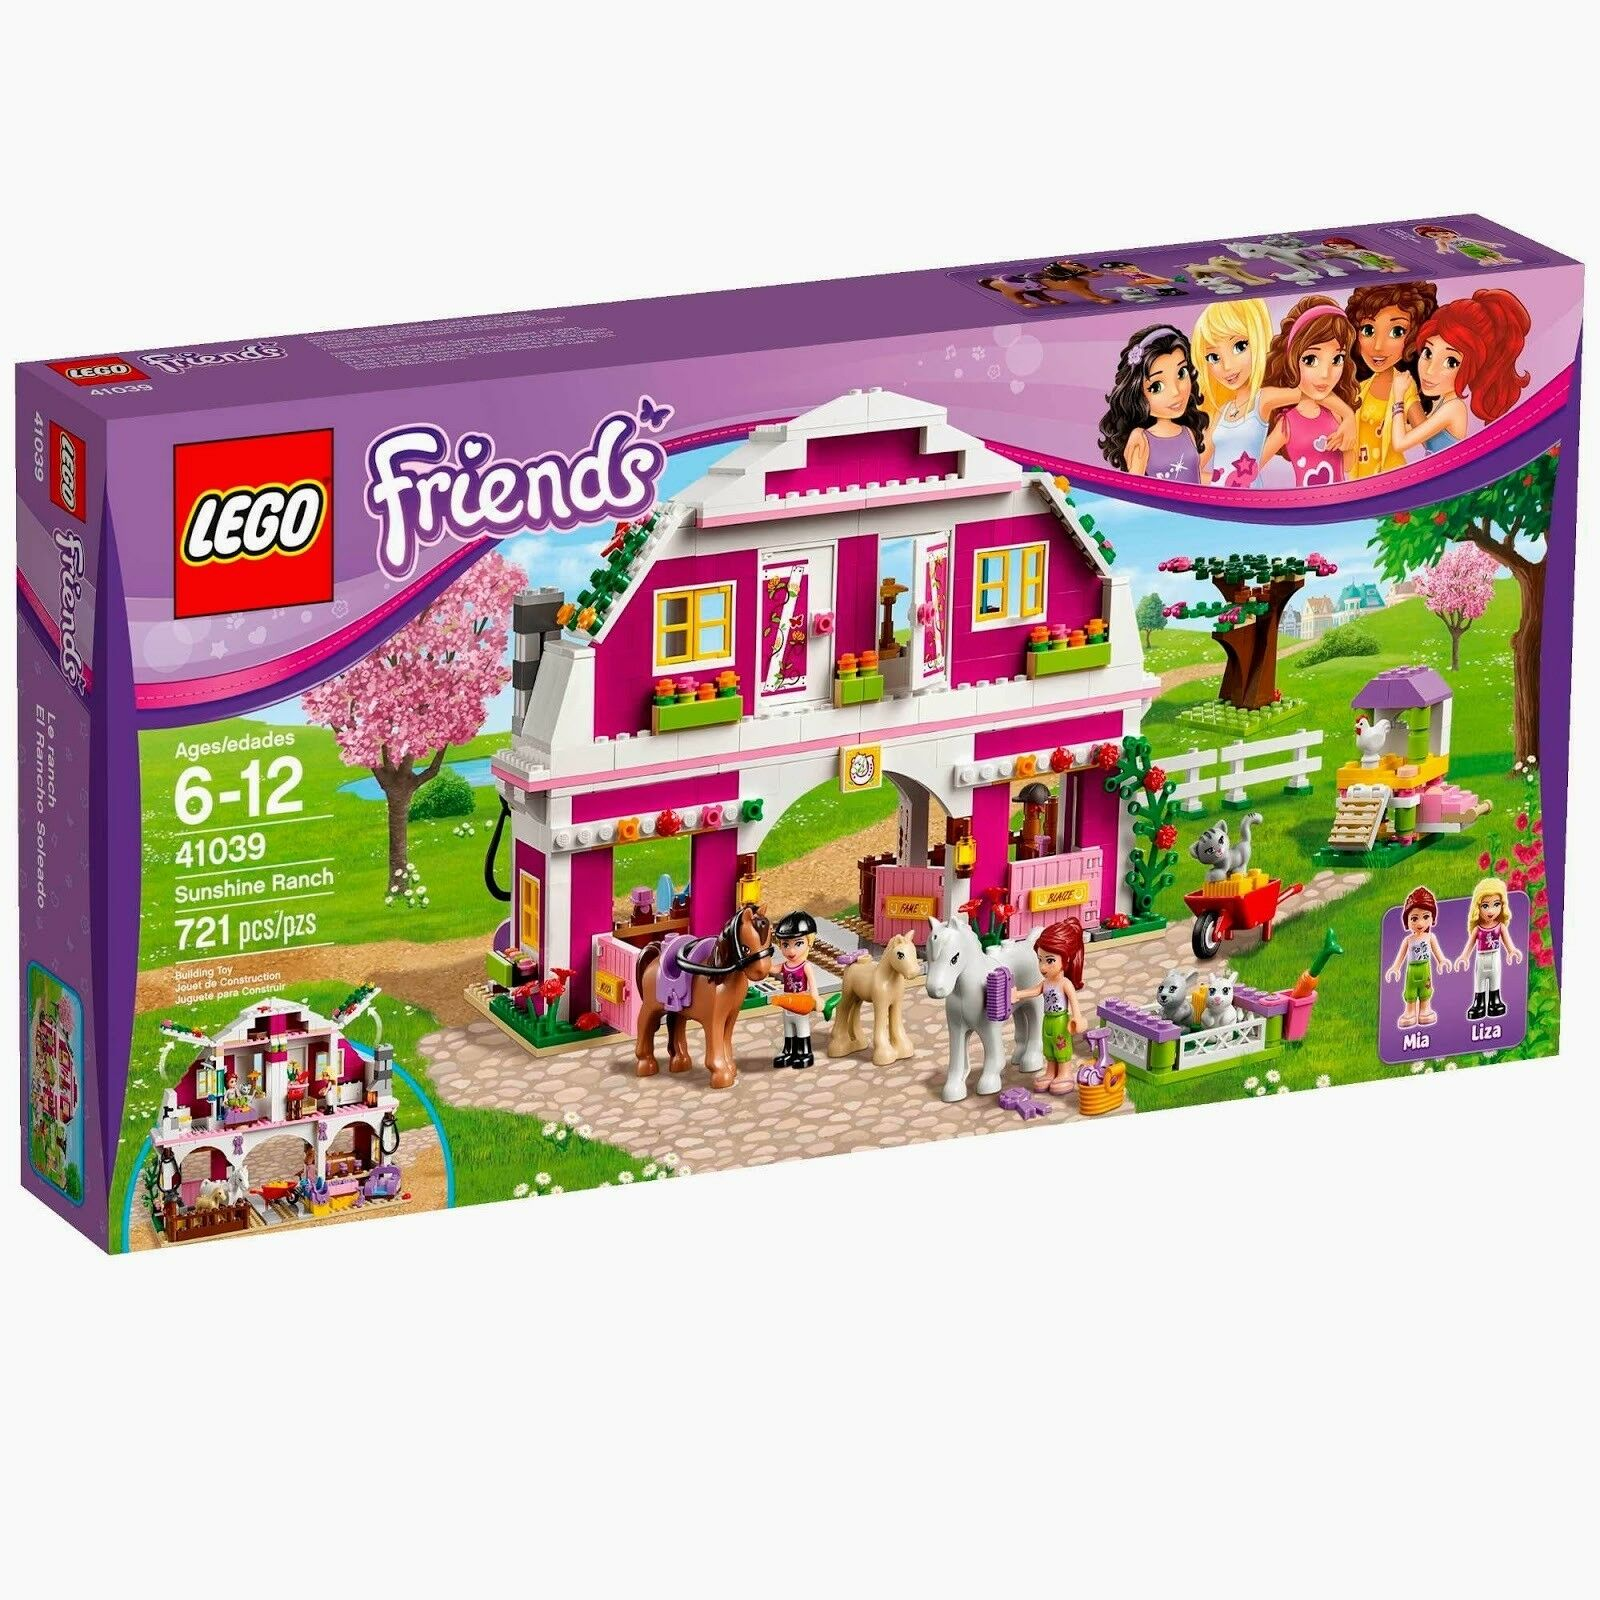 Lego vänner 41039 SUNSHINE RANGH Horse Saddle Pony Minifigs Xmas Nuvarande NISB